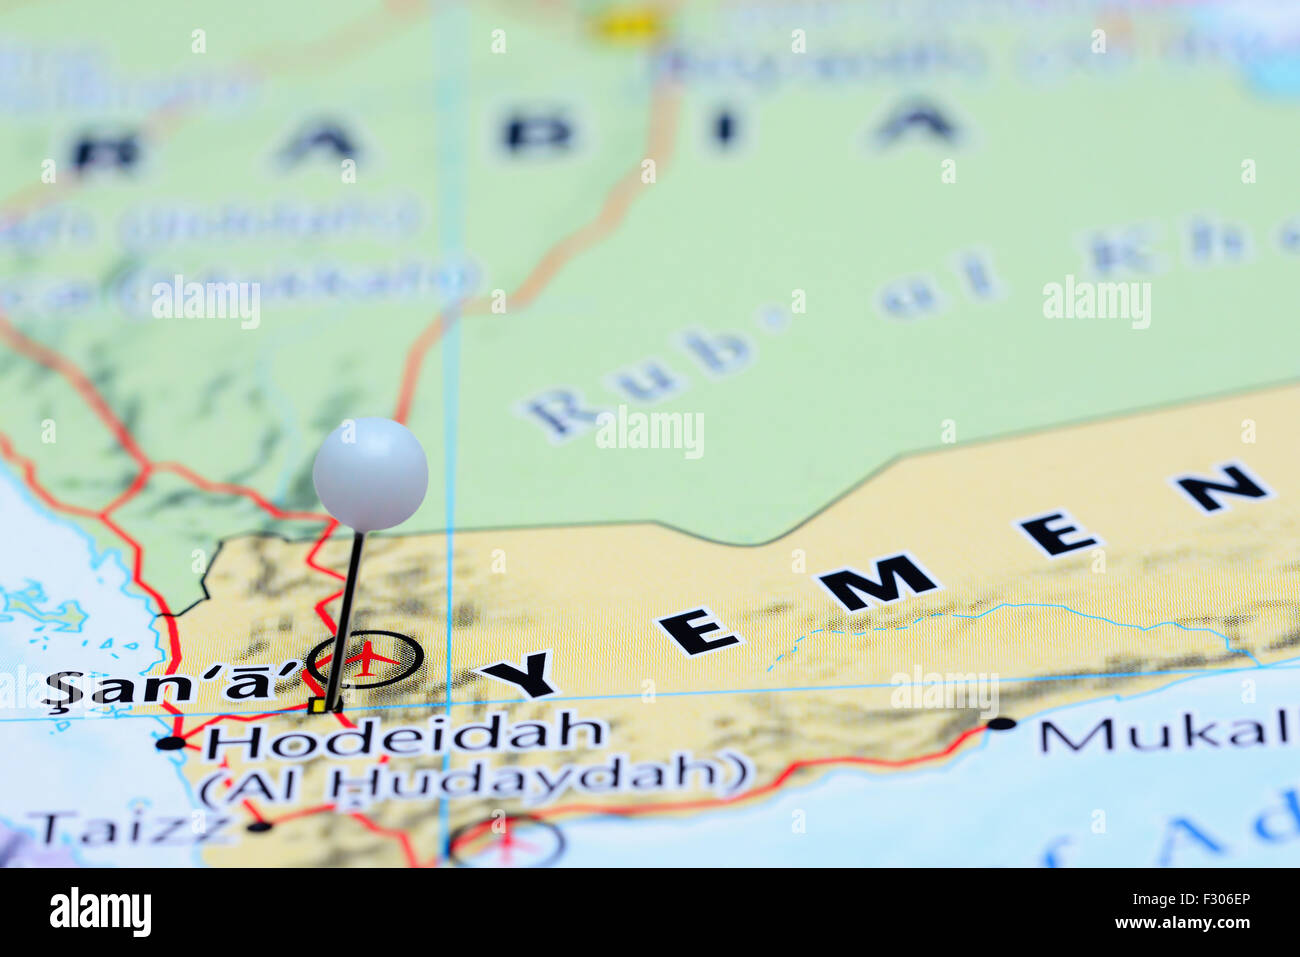 Sanaa Pinned On A Map Of Asia Stock Photo Royalty Free Image - Sanaa map